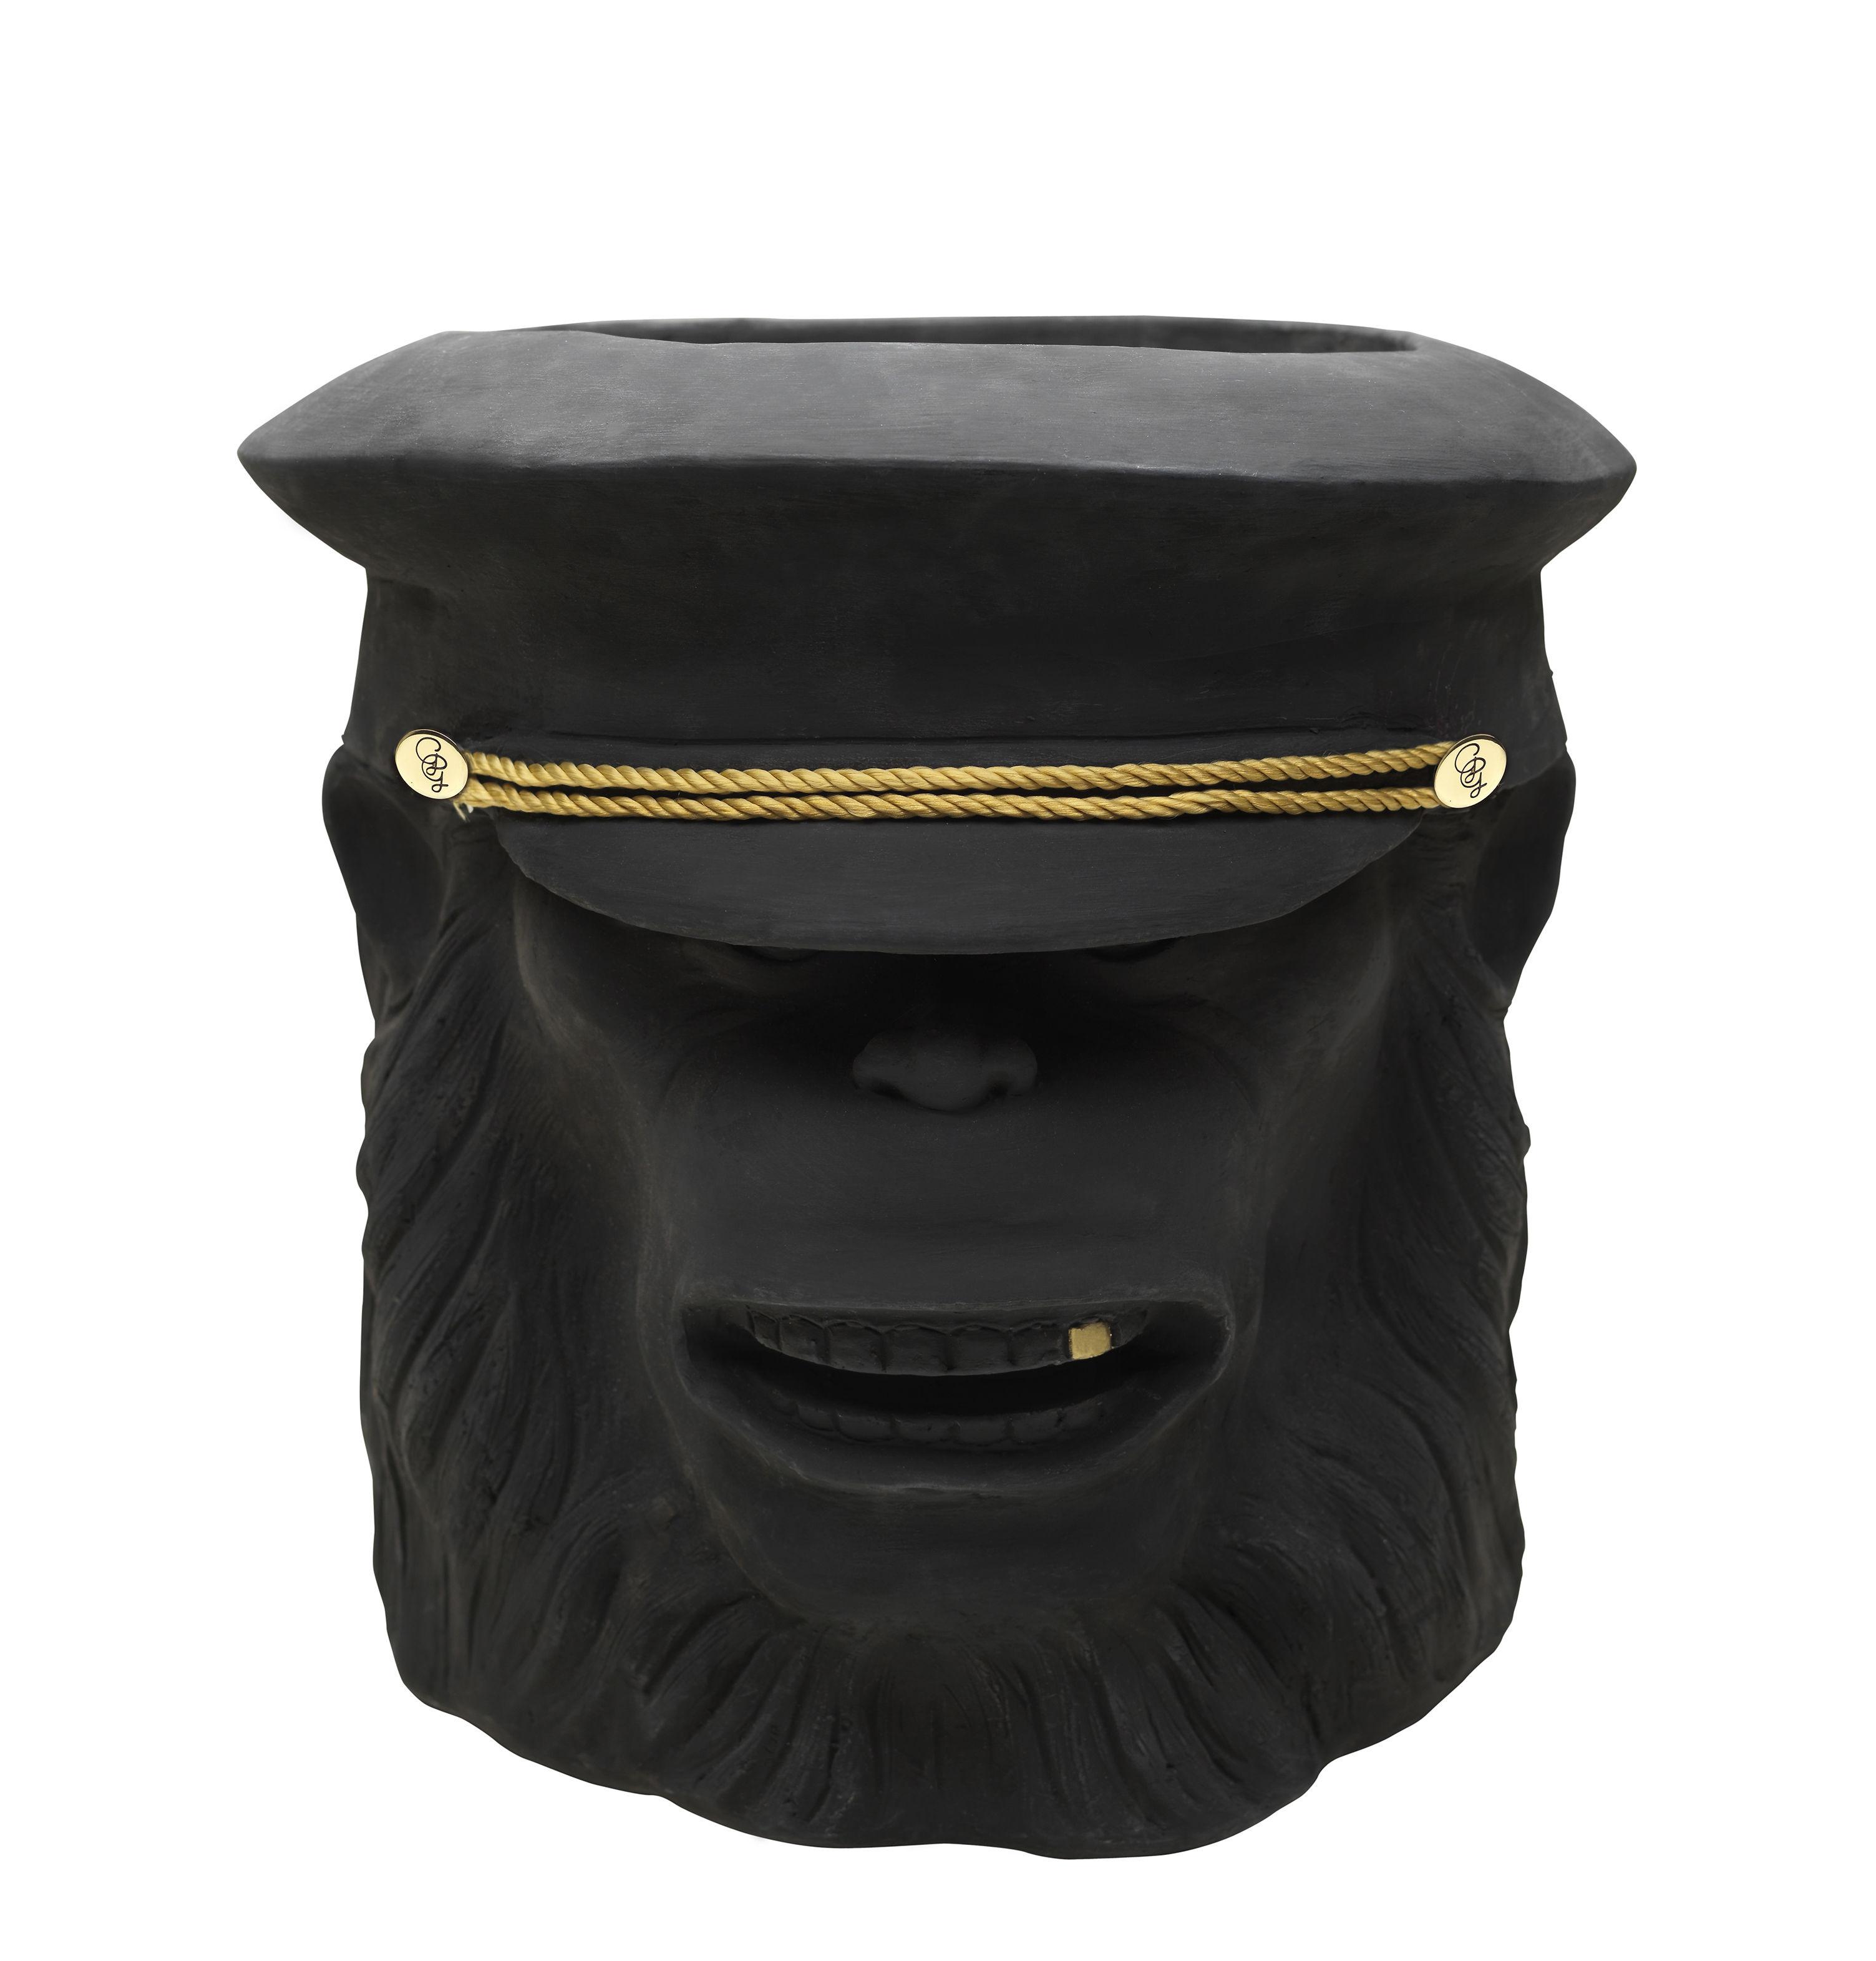 Outdoor - Pots & Plants - Monkey Face Flowerpot - Ceramic - H 40 cm by Garden Glory - Monkey / Black - Brass, Painted terracotta